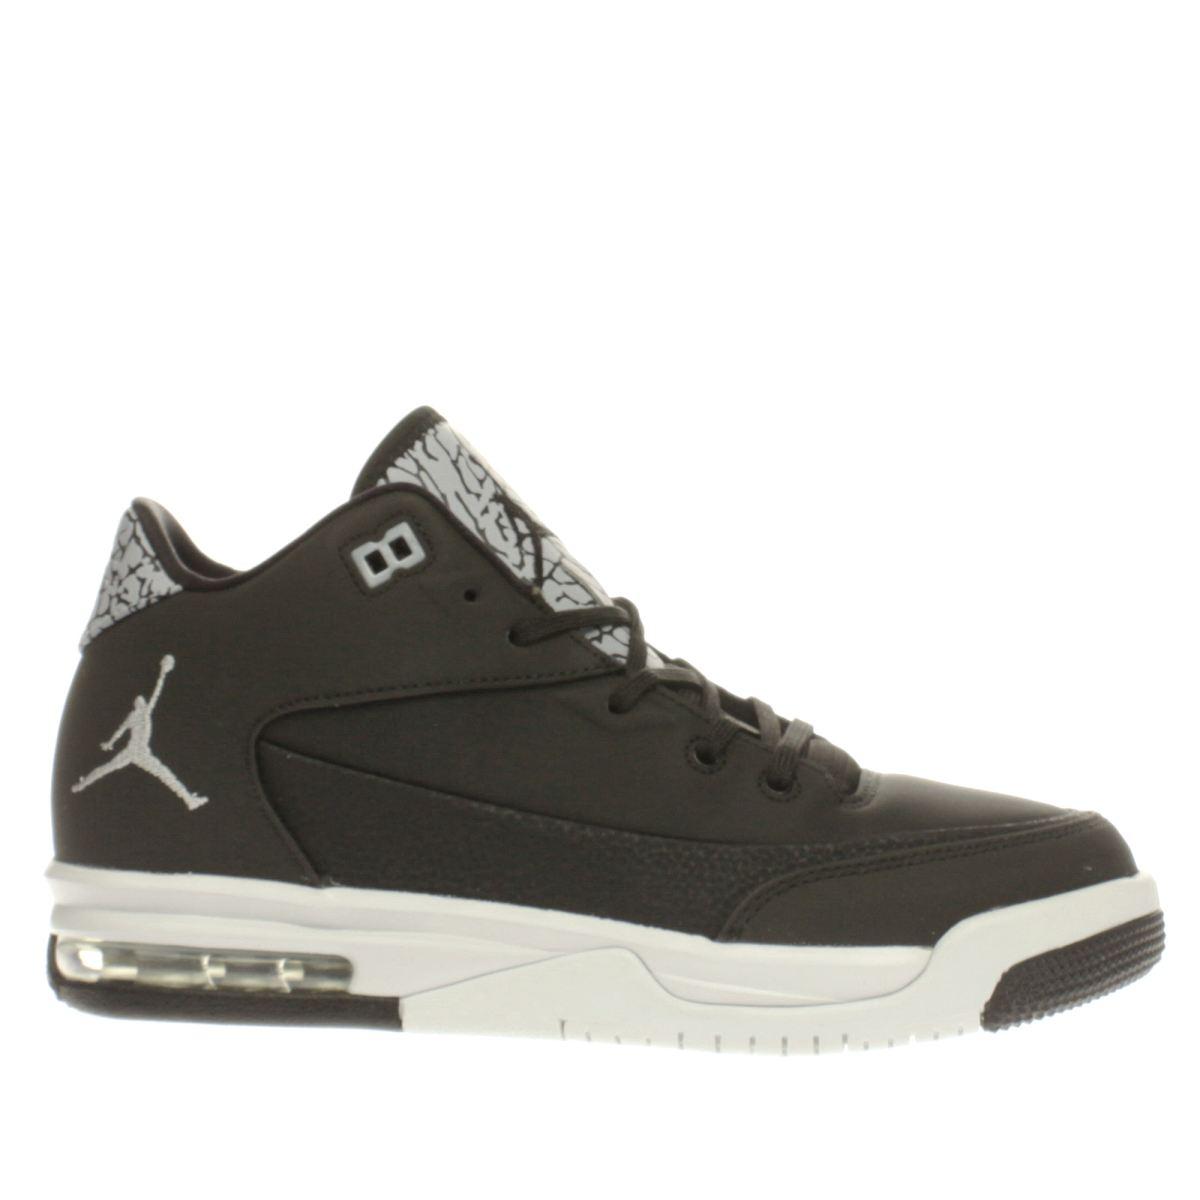 nike jordan Nike Jordan Black & Silver Flight Origin 3 Unisex Youth